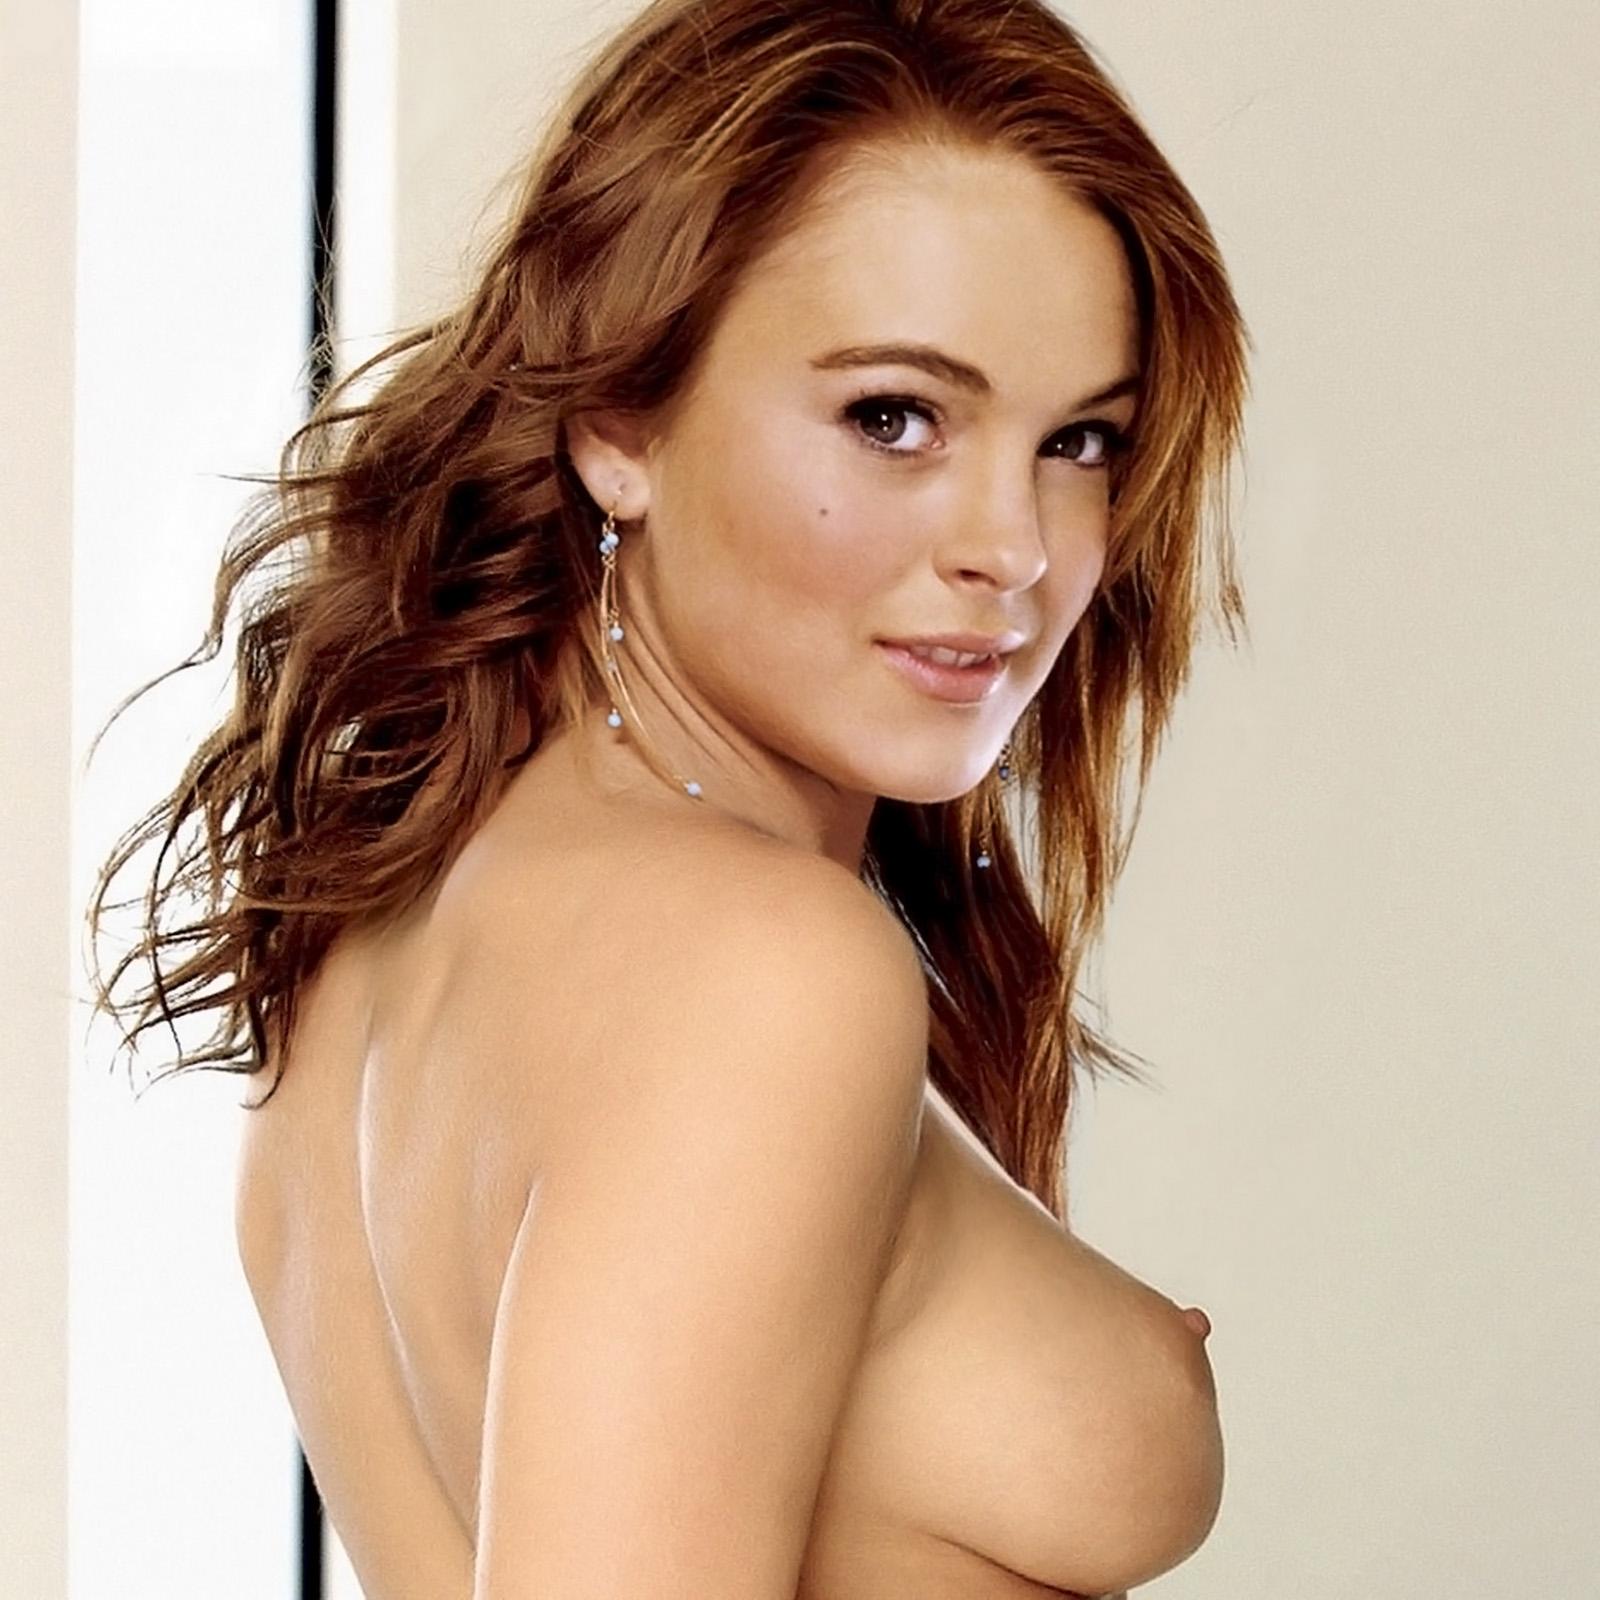 Hot naked photos of lindsay lohan